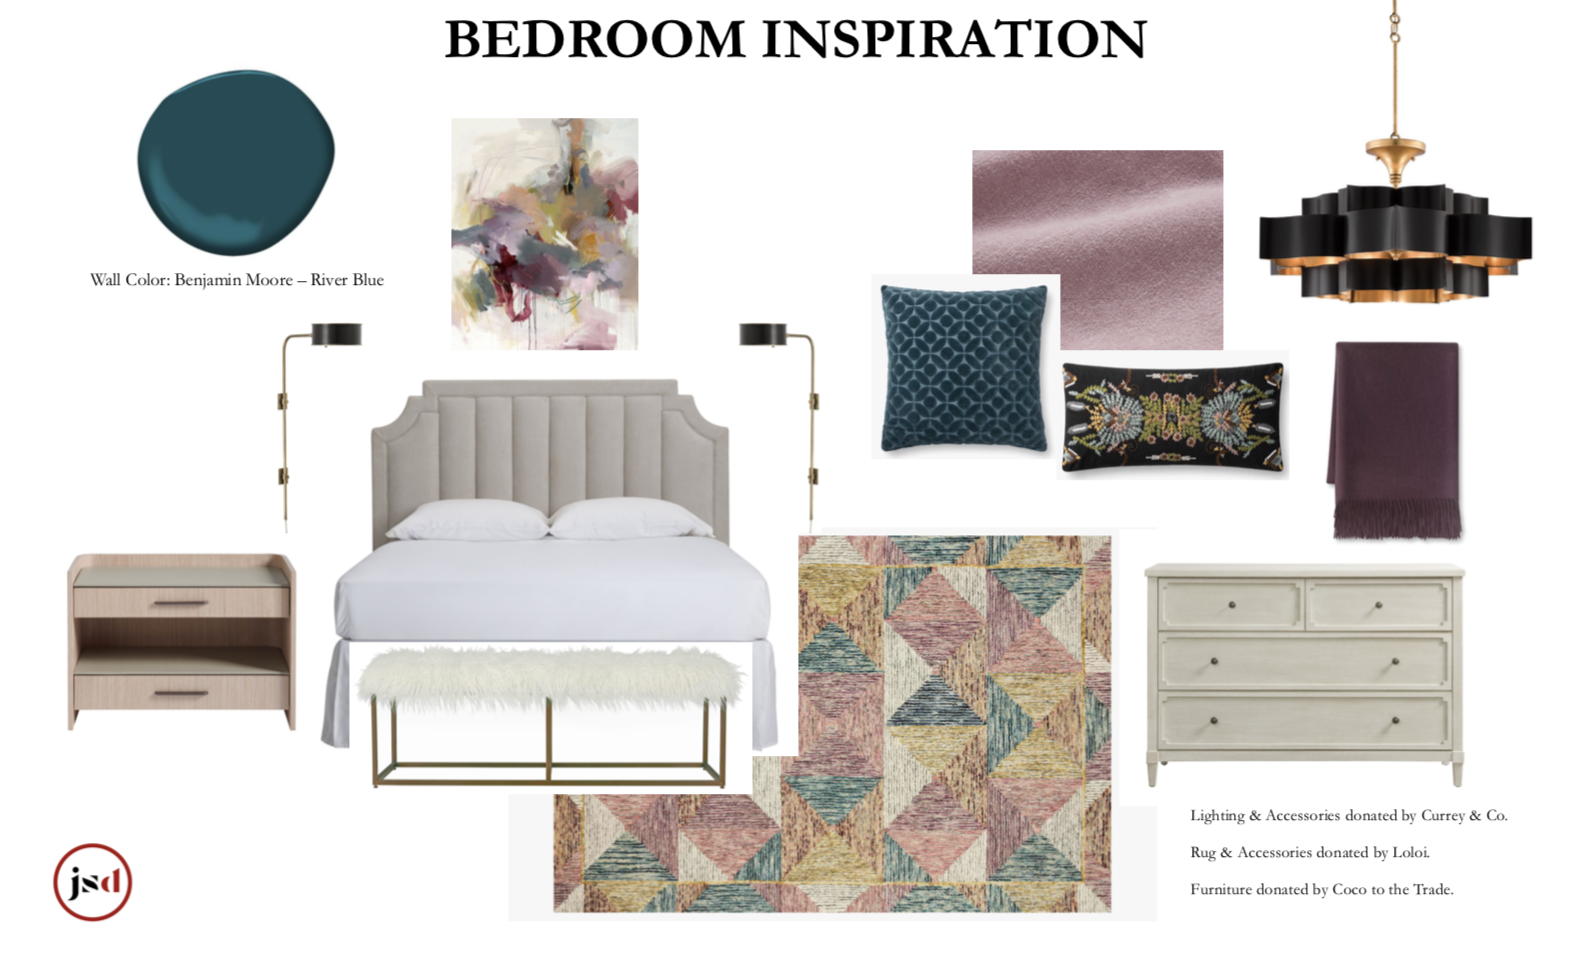 bedroom inspiration cream headboard benjamin moore river blue currey co lighting rose duvet